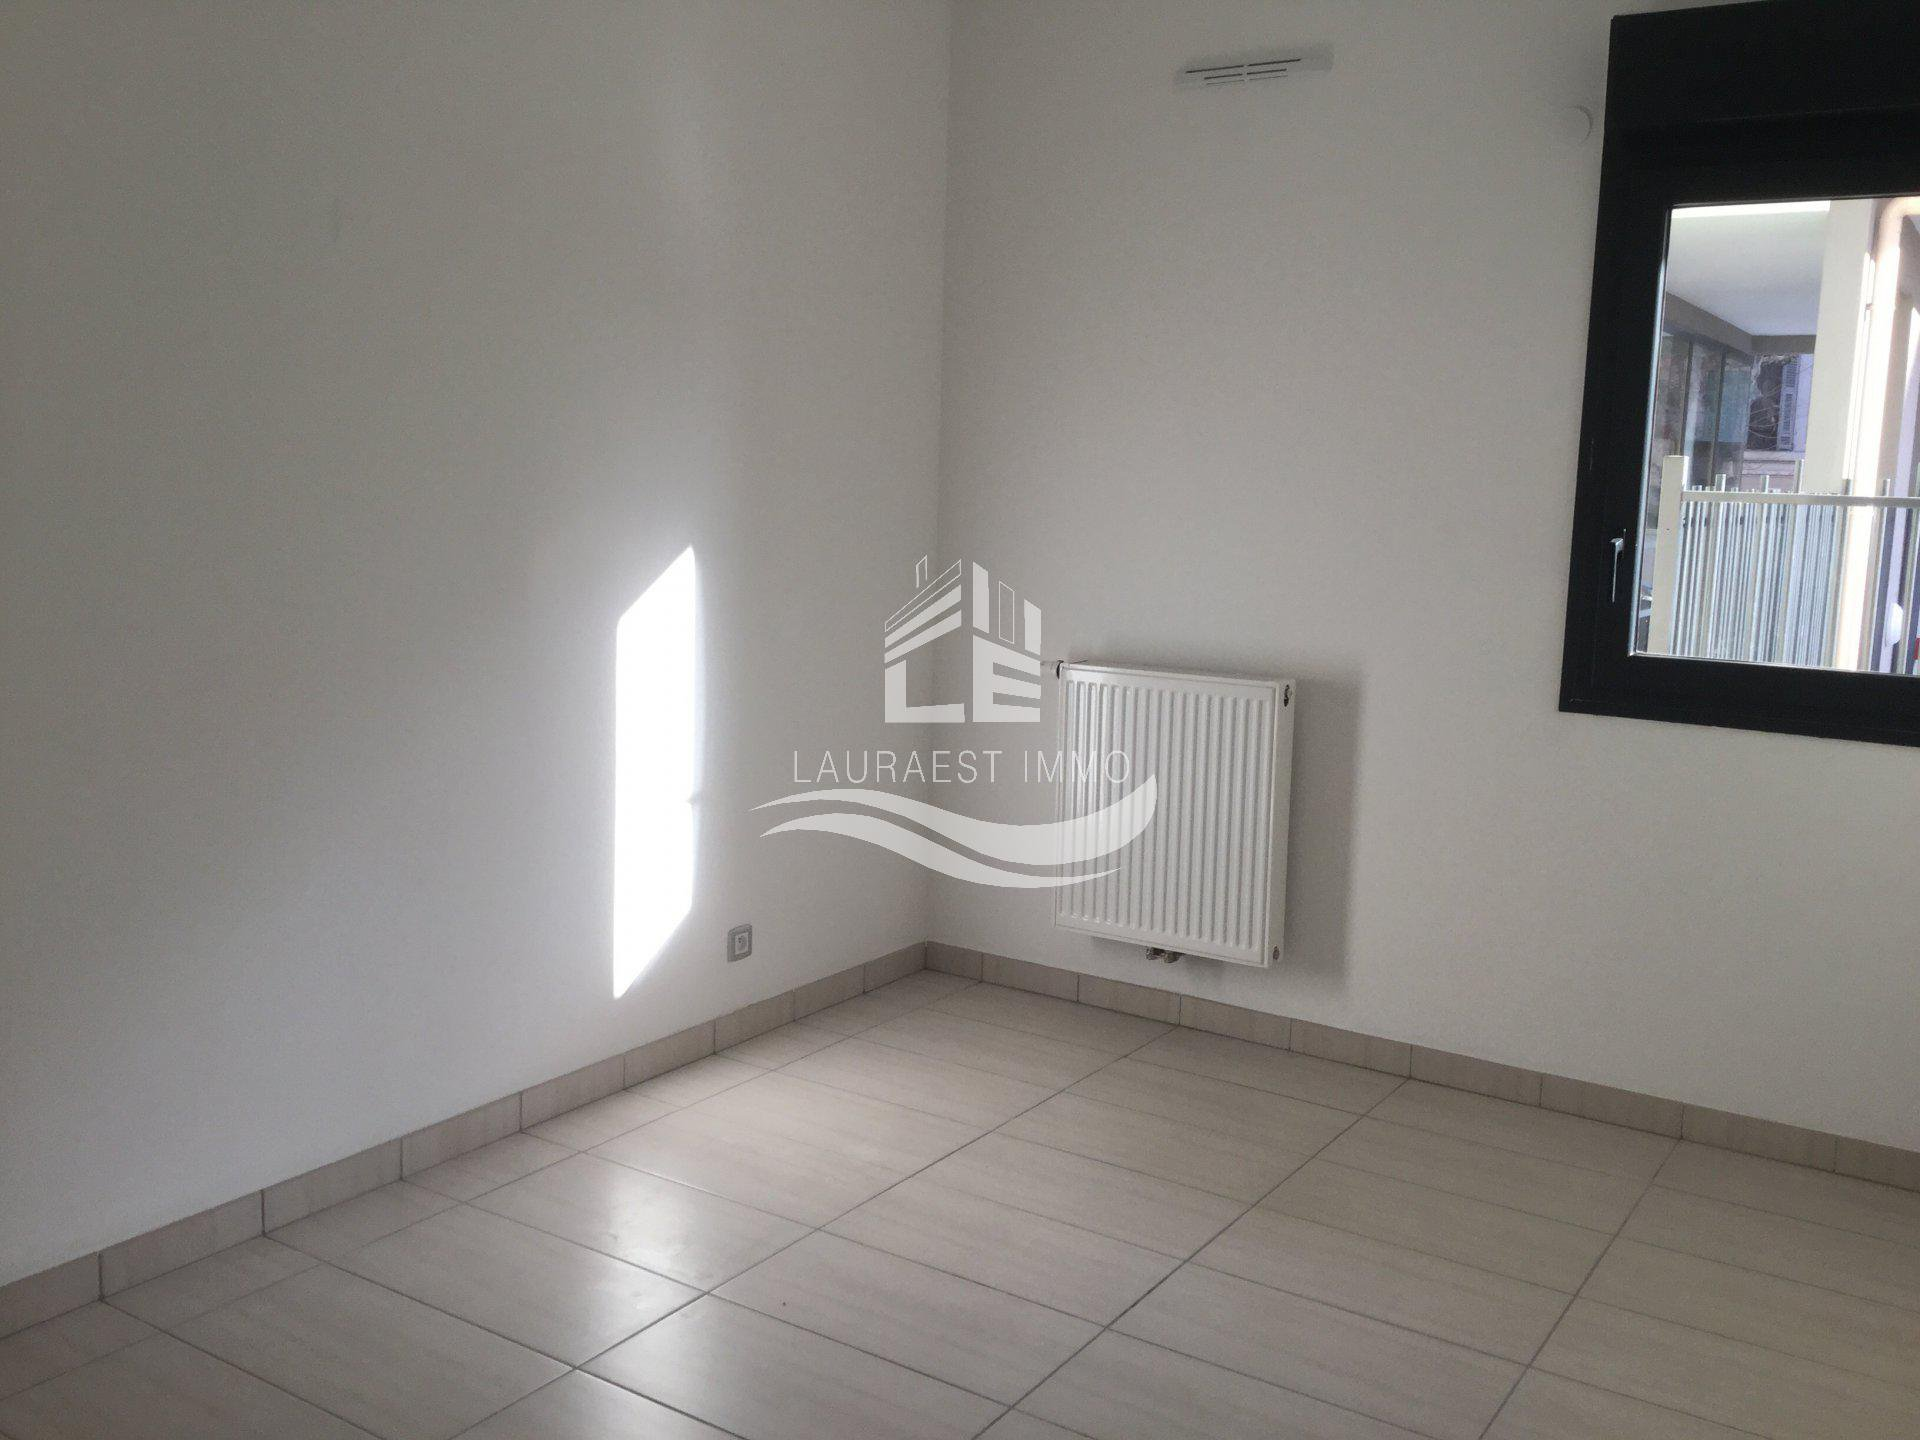 Studio /Grosso Immeuble Neuf